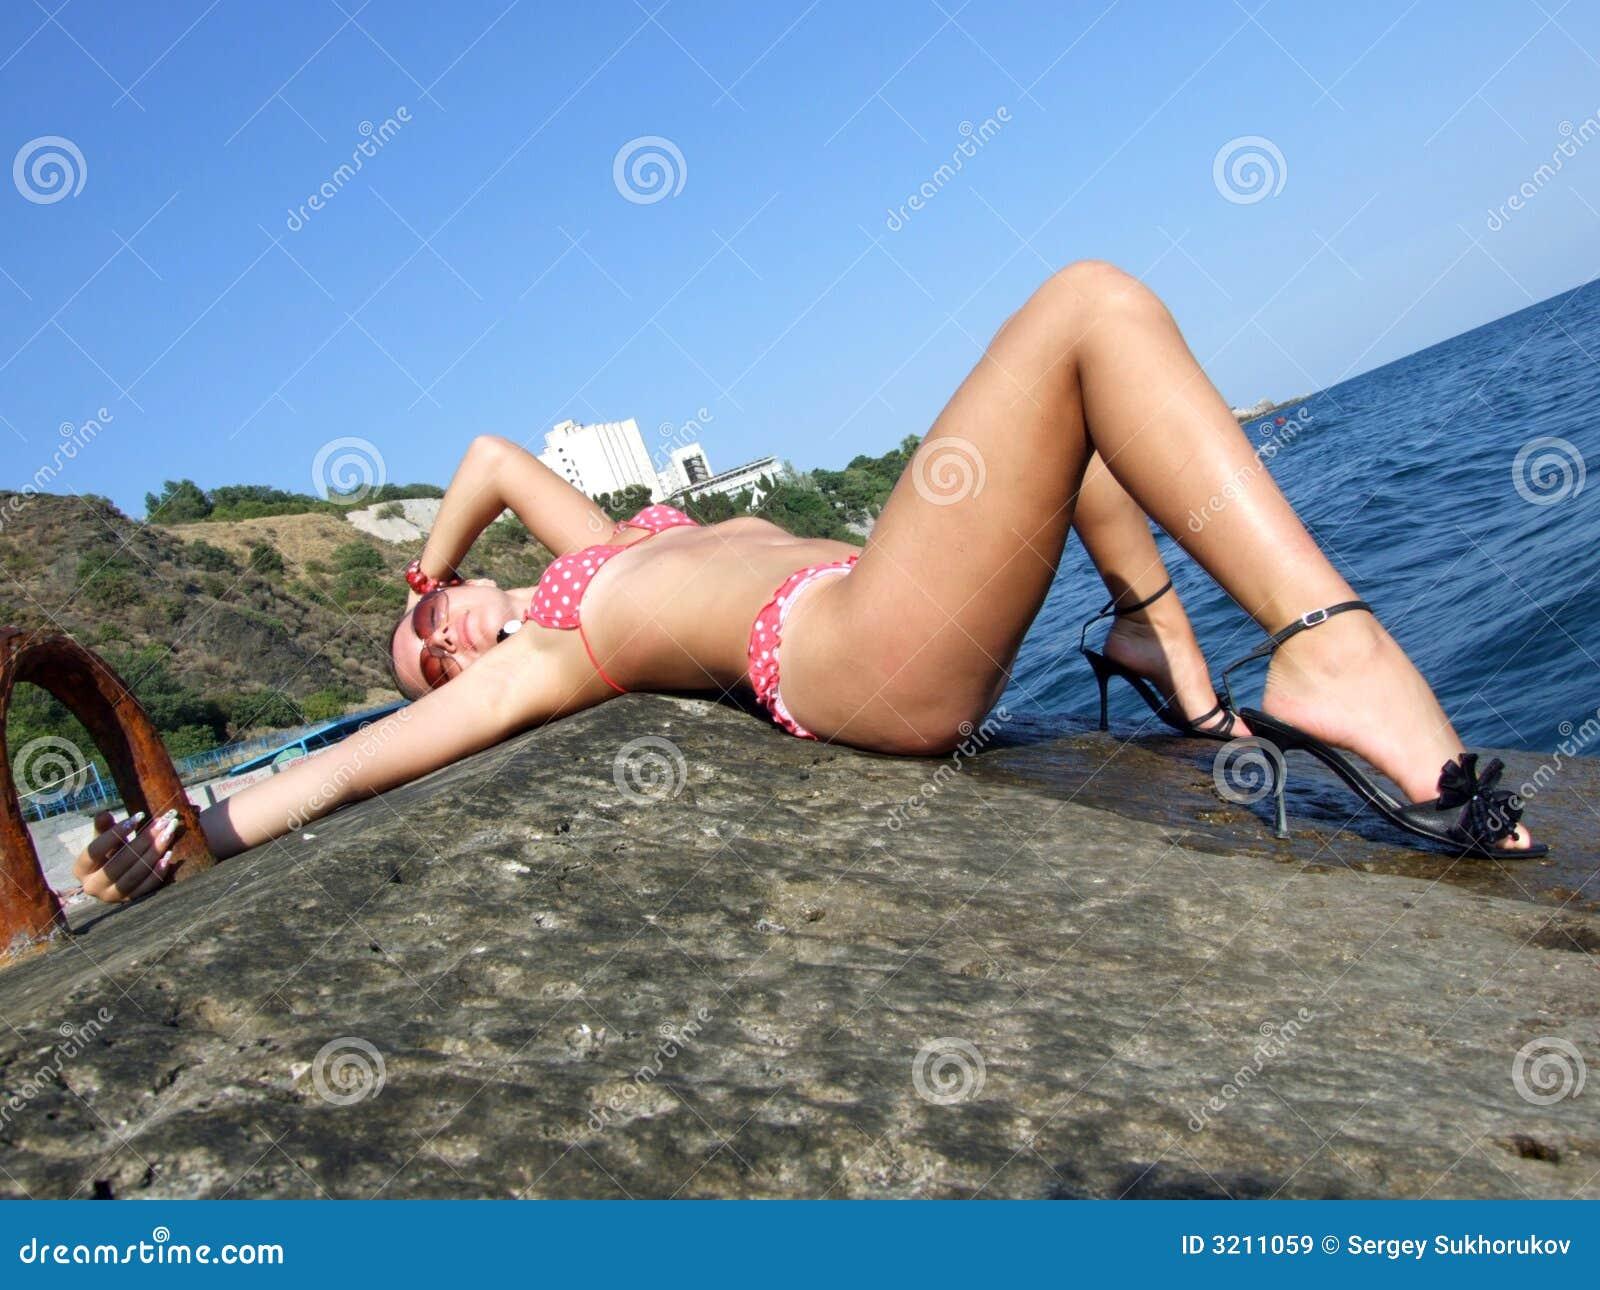 The girl lays on a wharf